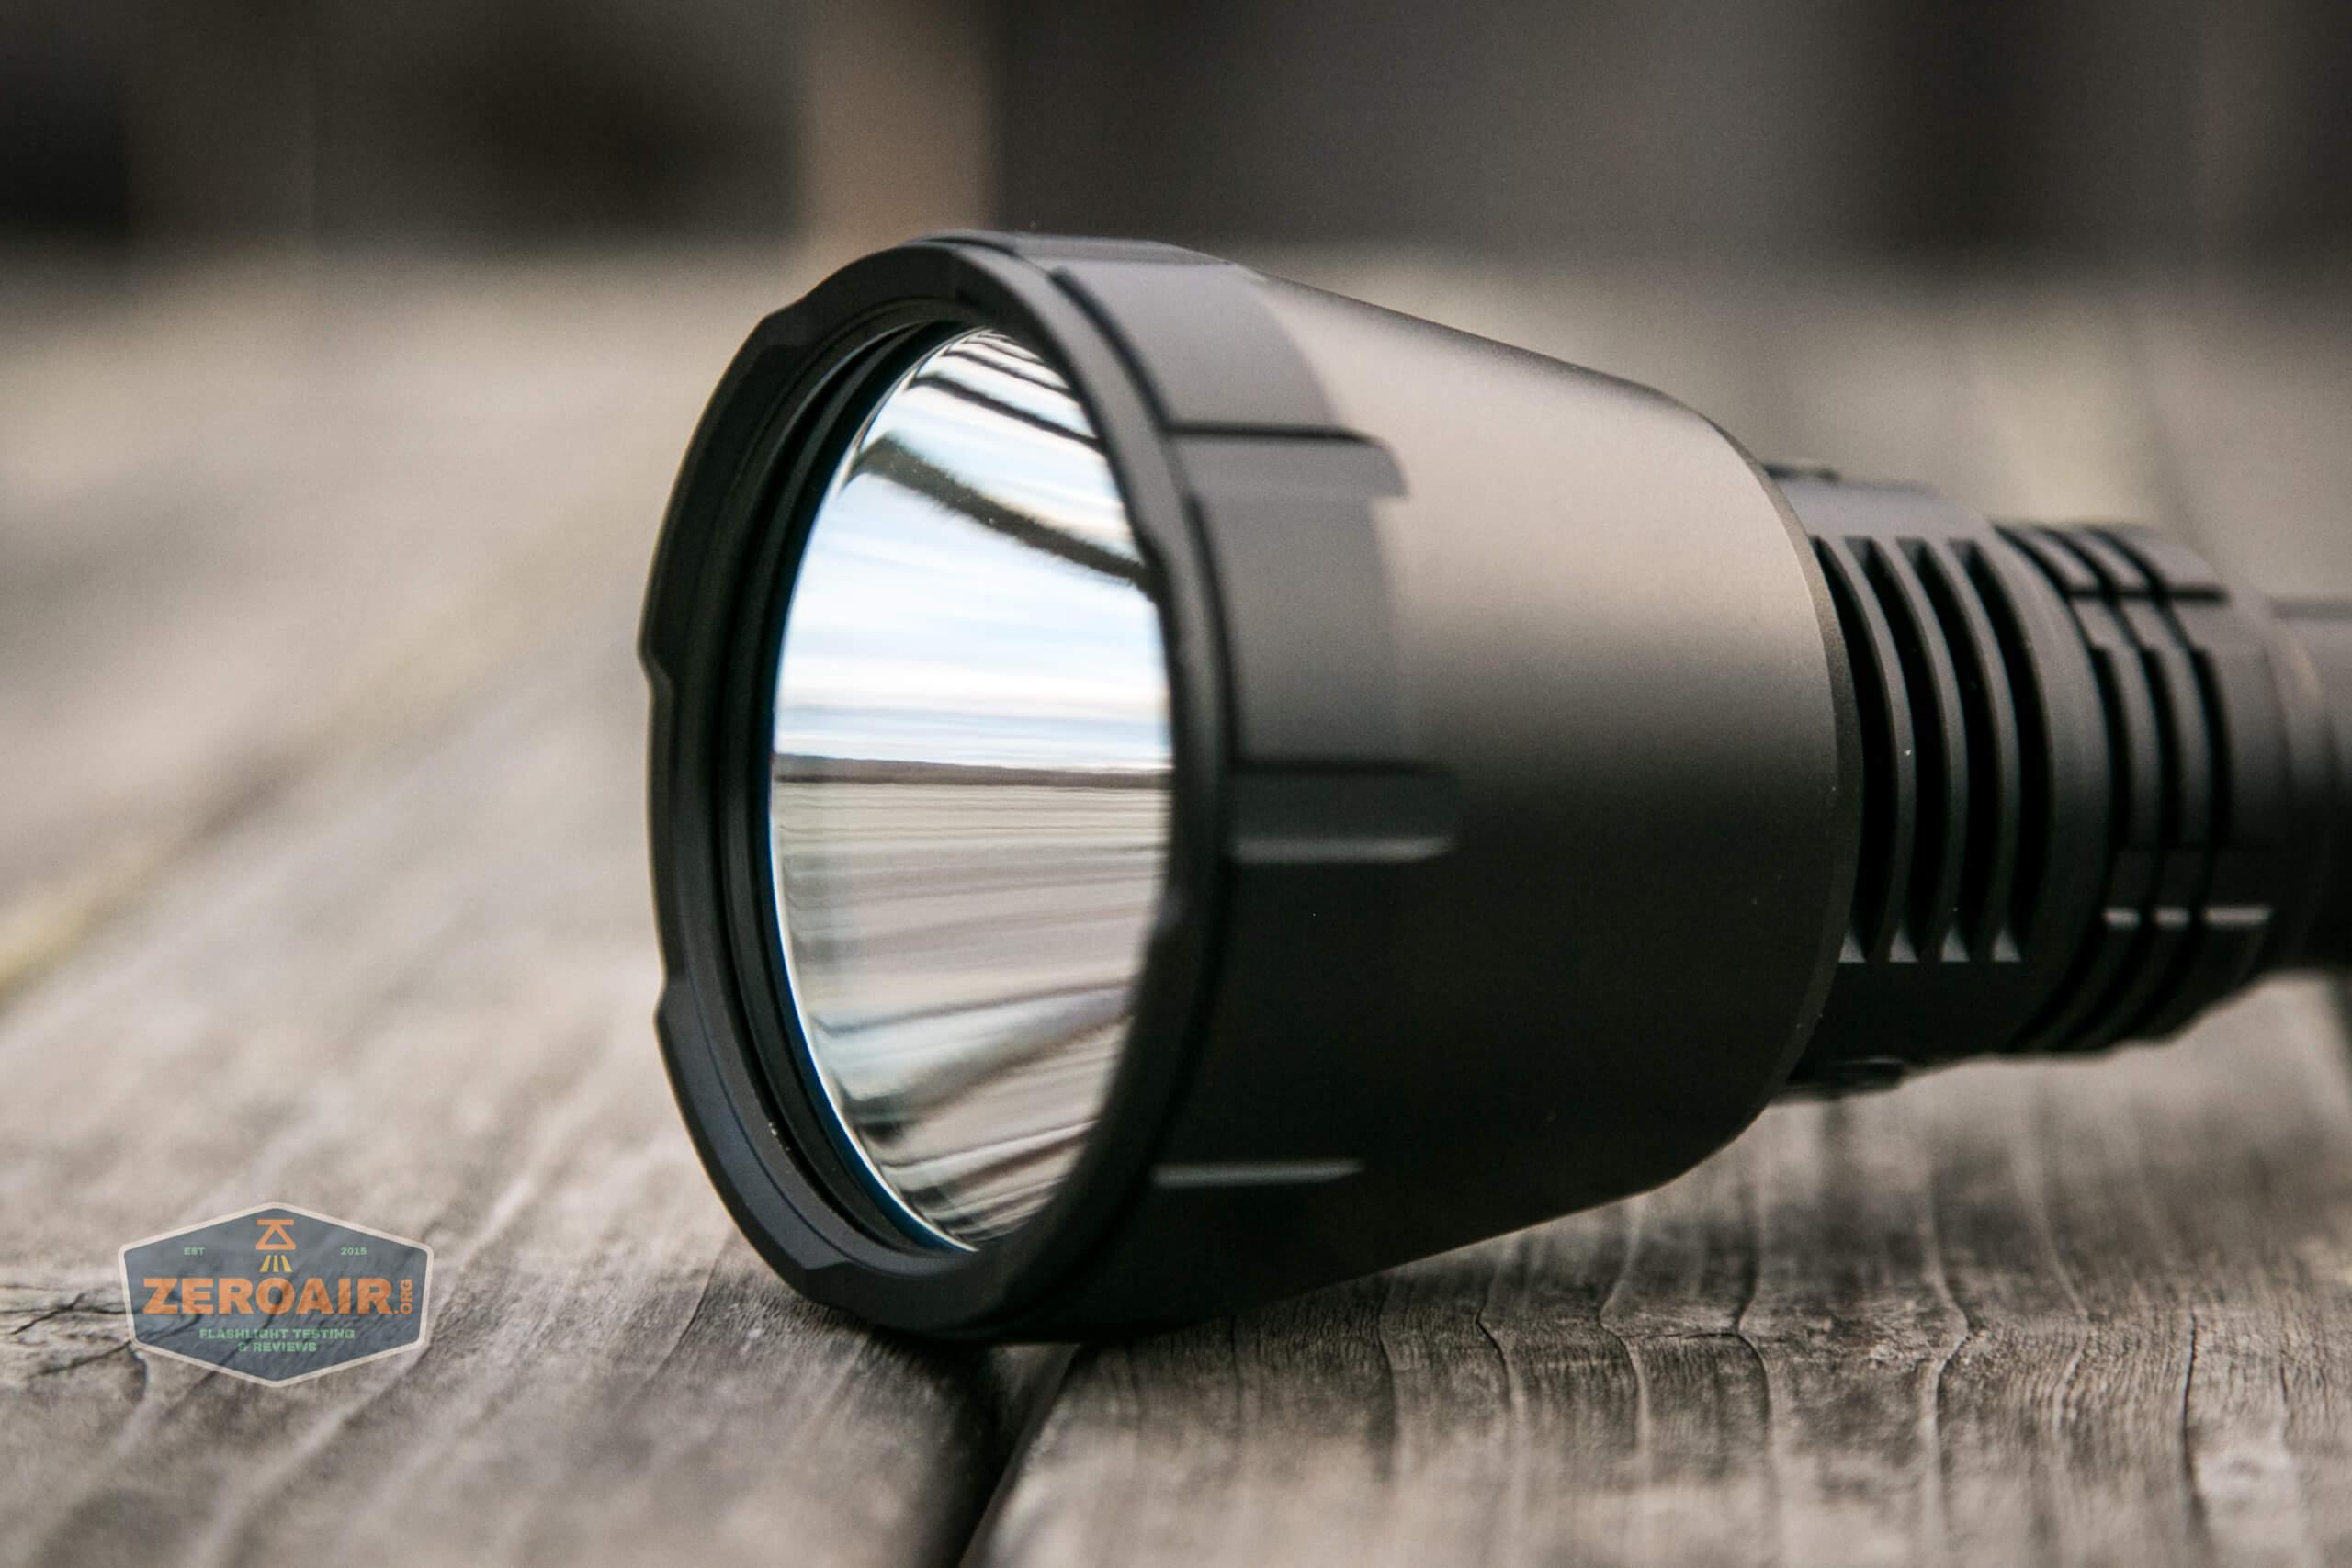 imalent ut90 reflector